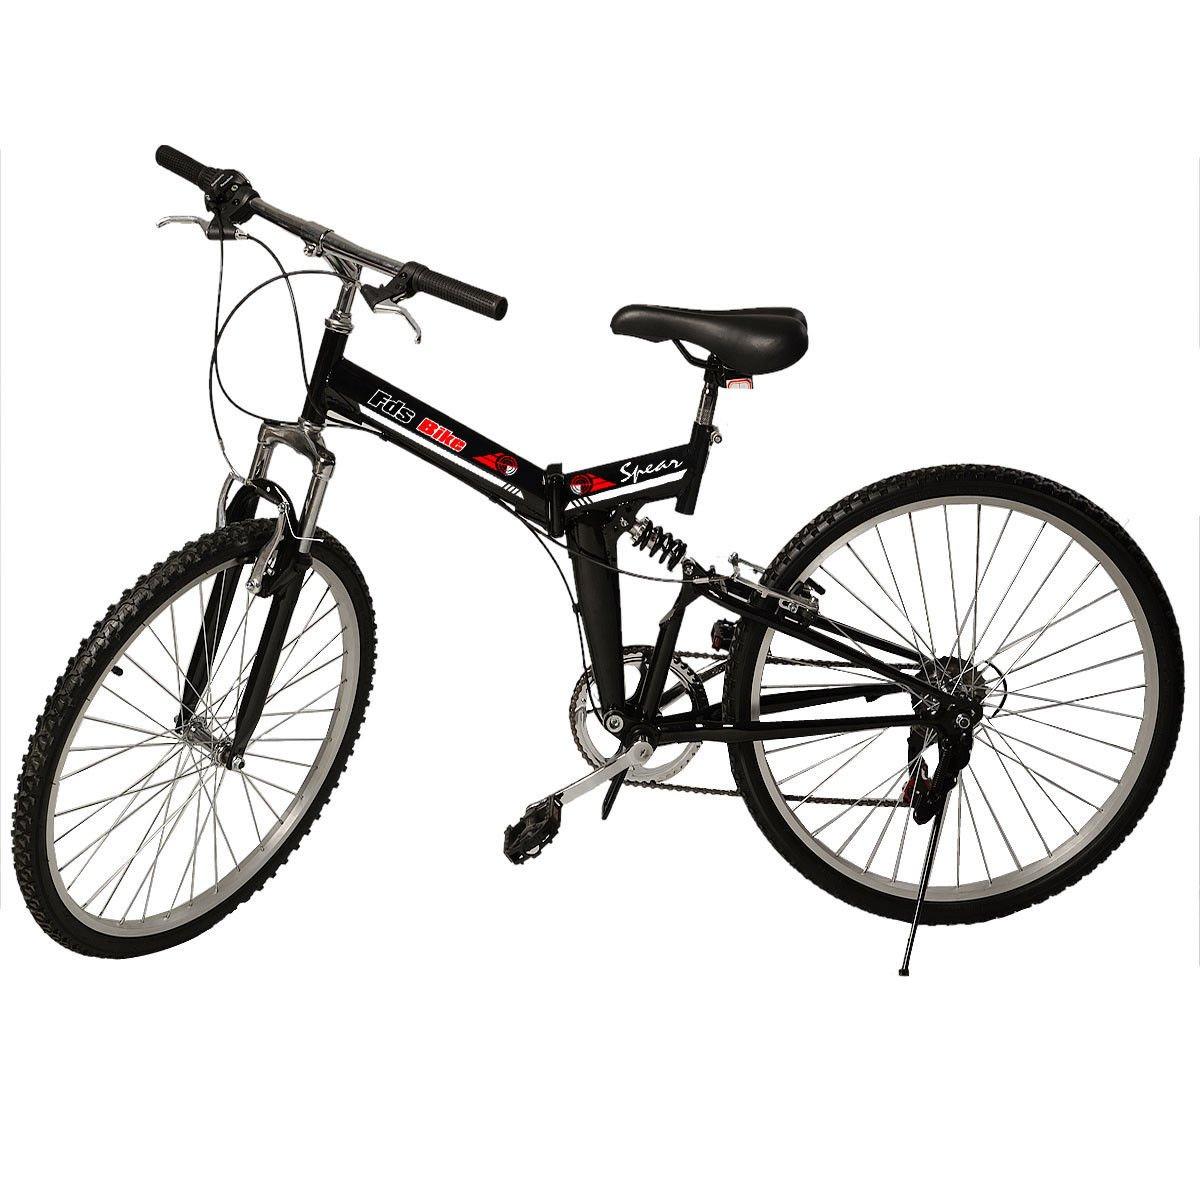 New 26 Folding 6 Speed Mountain Bike Bicycle School